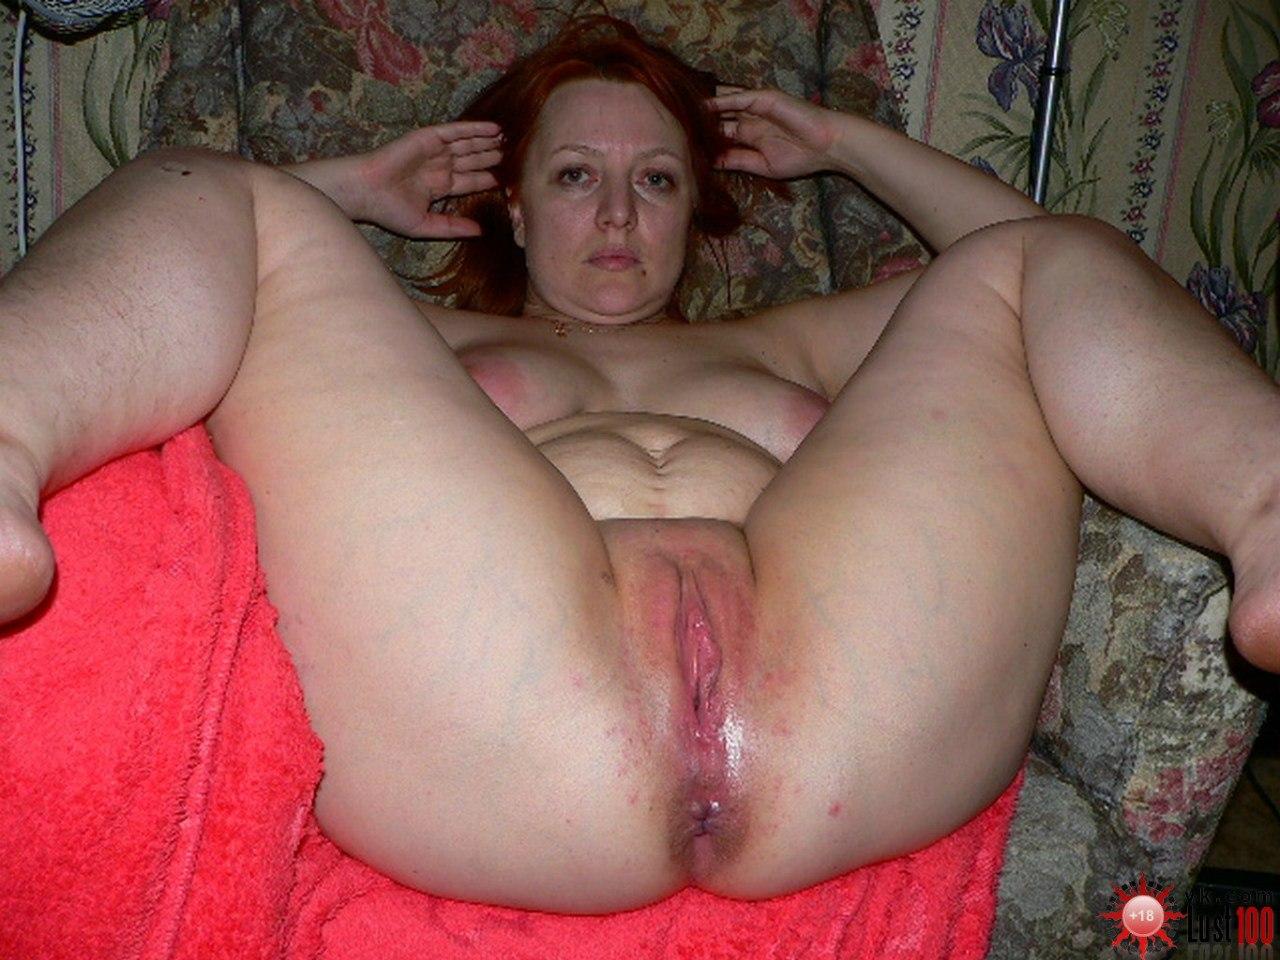 Домашнее фото порно зрелых баб